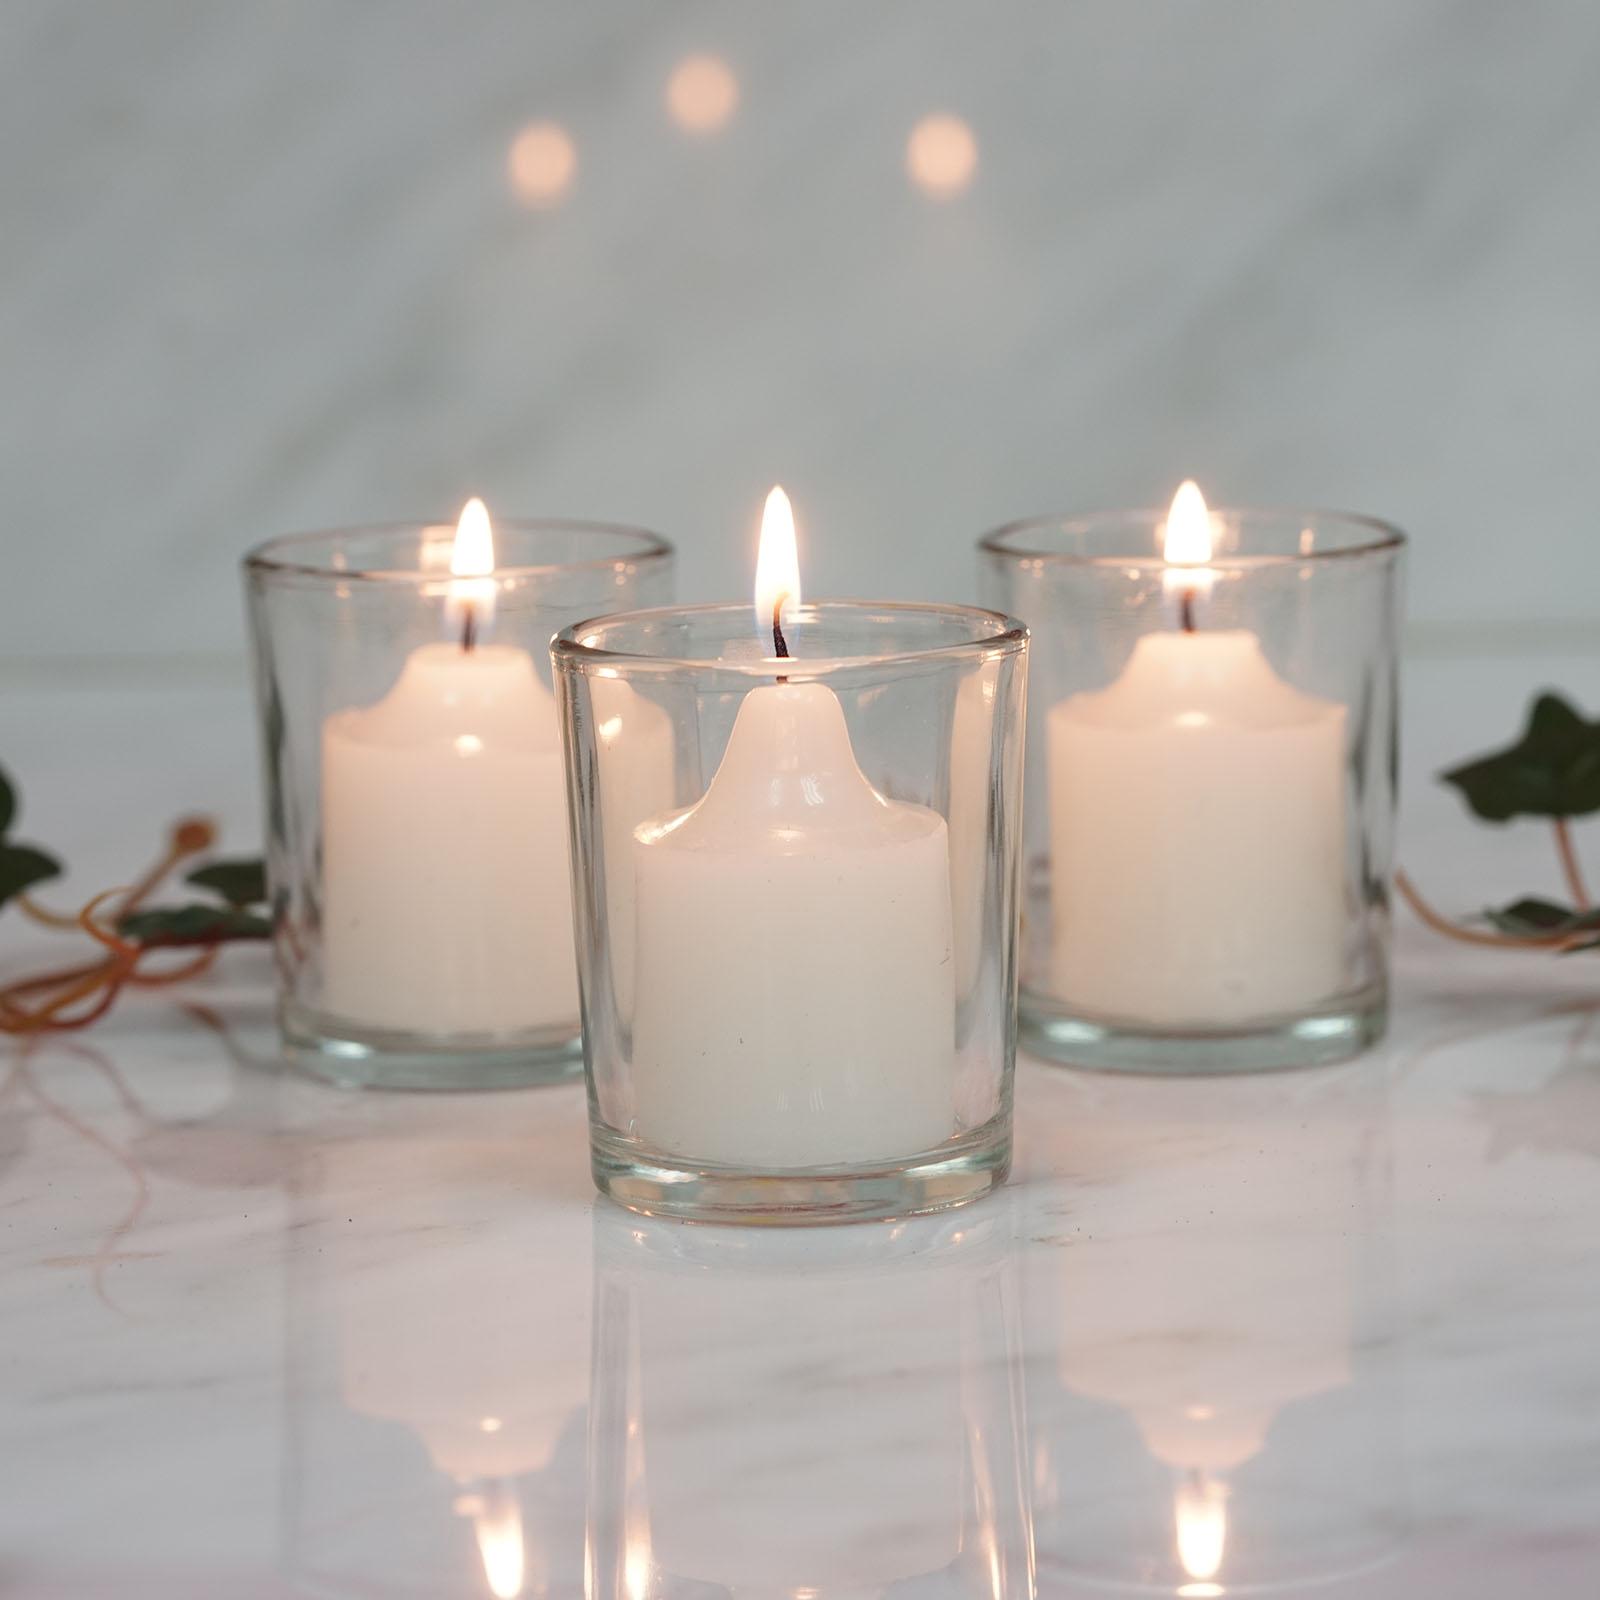 Clear Votive Candle Holders Wedding Favor Centerpiece Decorations Wholesale Ebay